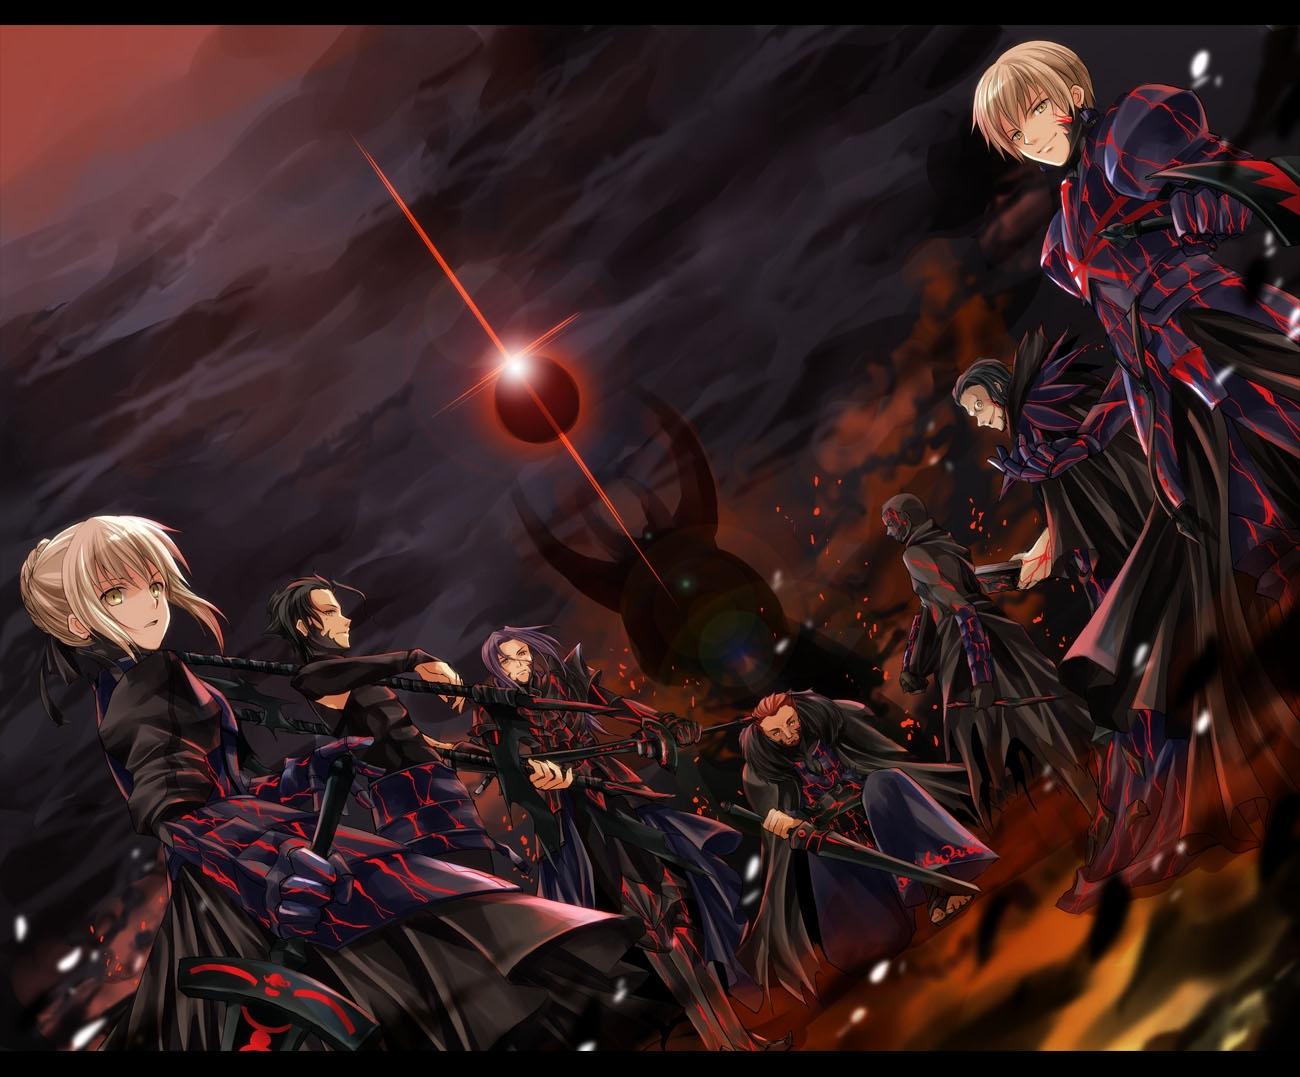 alexander_(fate) armor artoria_pendragon_(all) blonde_hair diarmuid_ua_duibhne_(fate) dress fate_(series) fate/stay_night fate/zero gilgamesh gilles_de_rais_(fate) iroha_(shiki) jpeg_artifacts lancelot_(fate) male saber sword true_assassin weapon